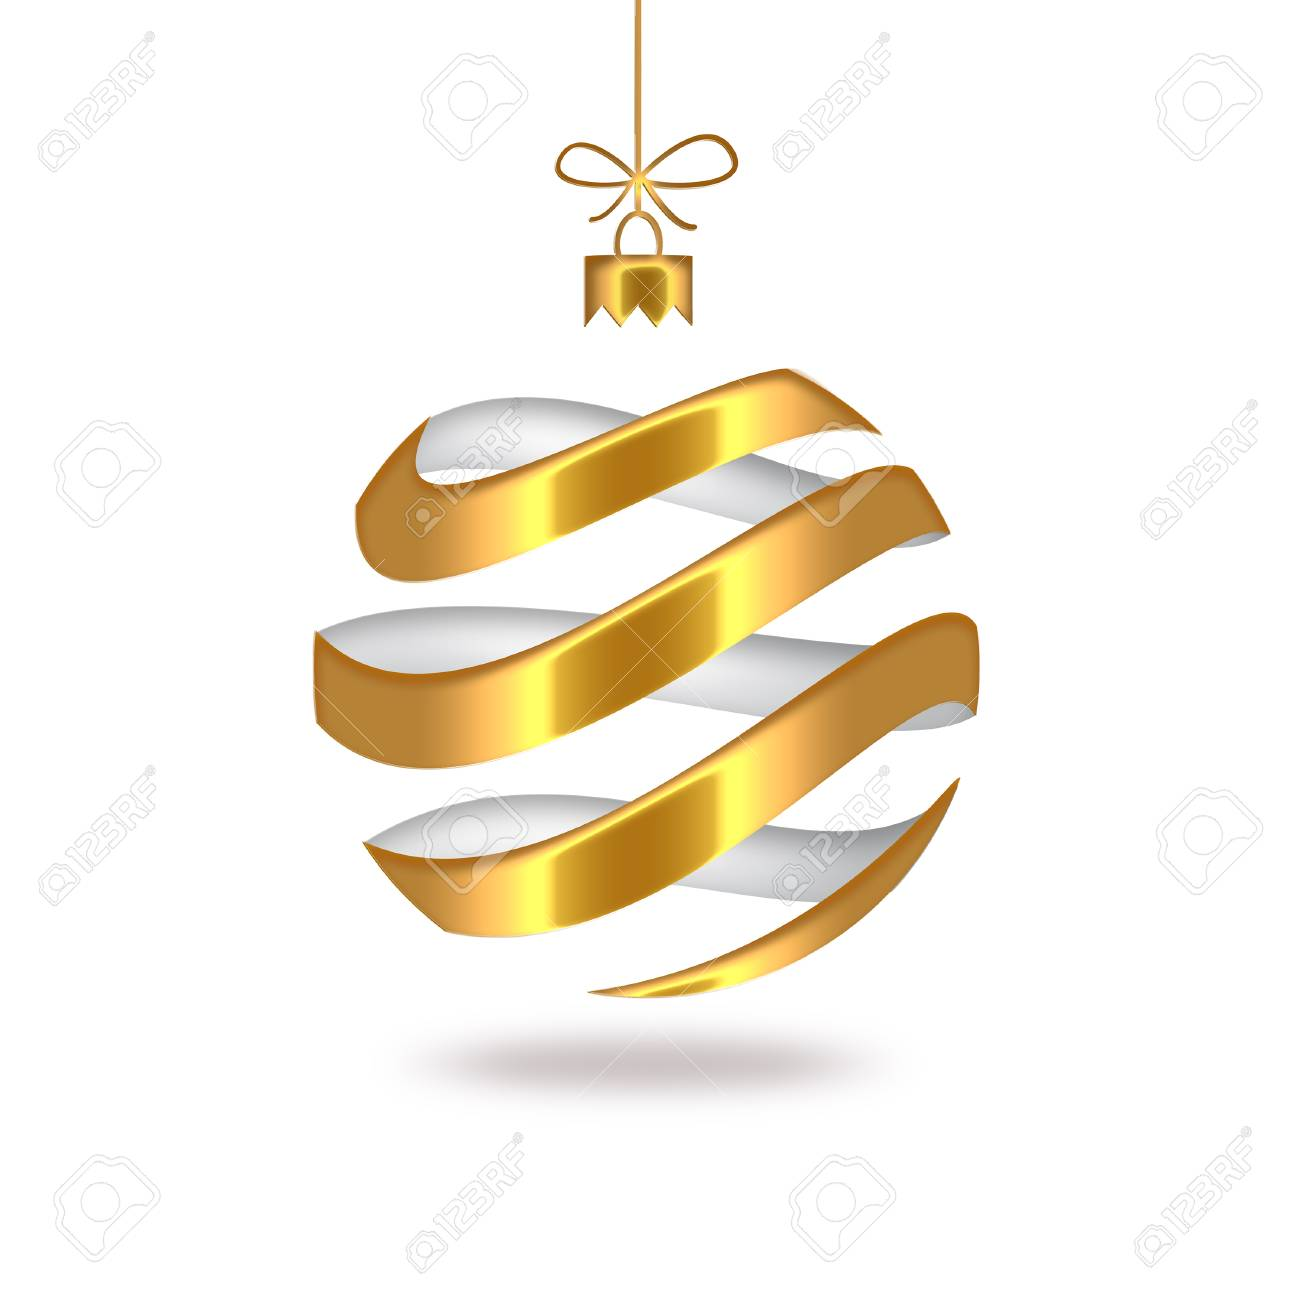 gold striped Christmas ball Stock Photo - 22497480